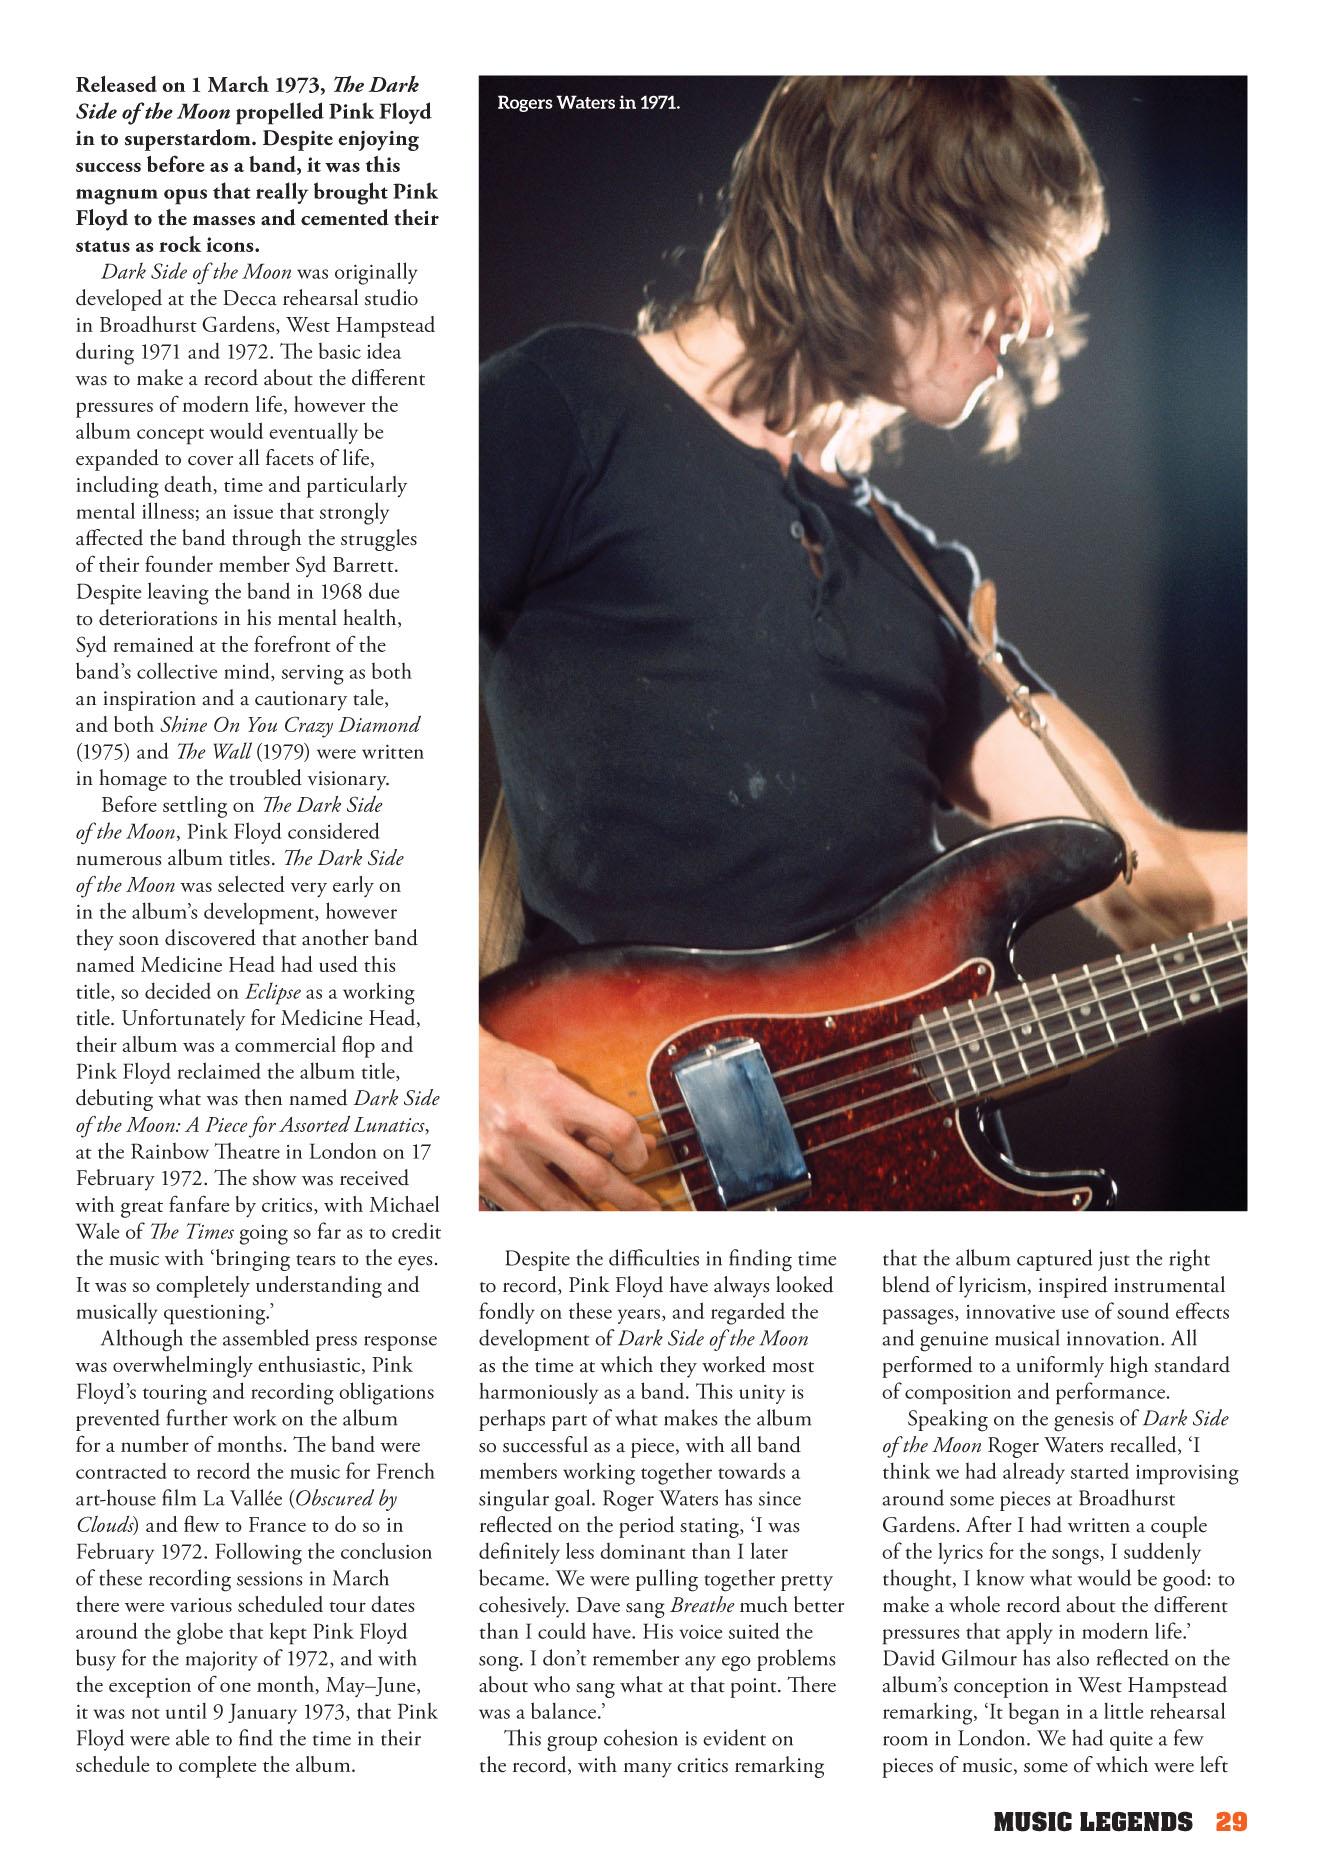 Music Legends Magazine 01 2019 PFloyd 02.jpg